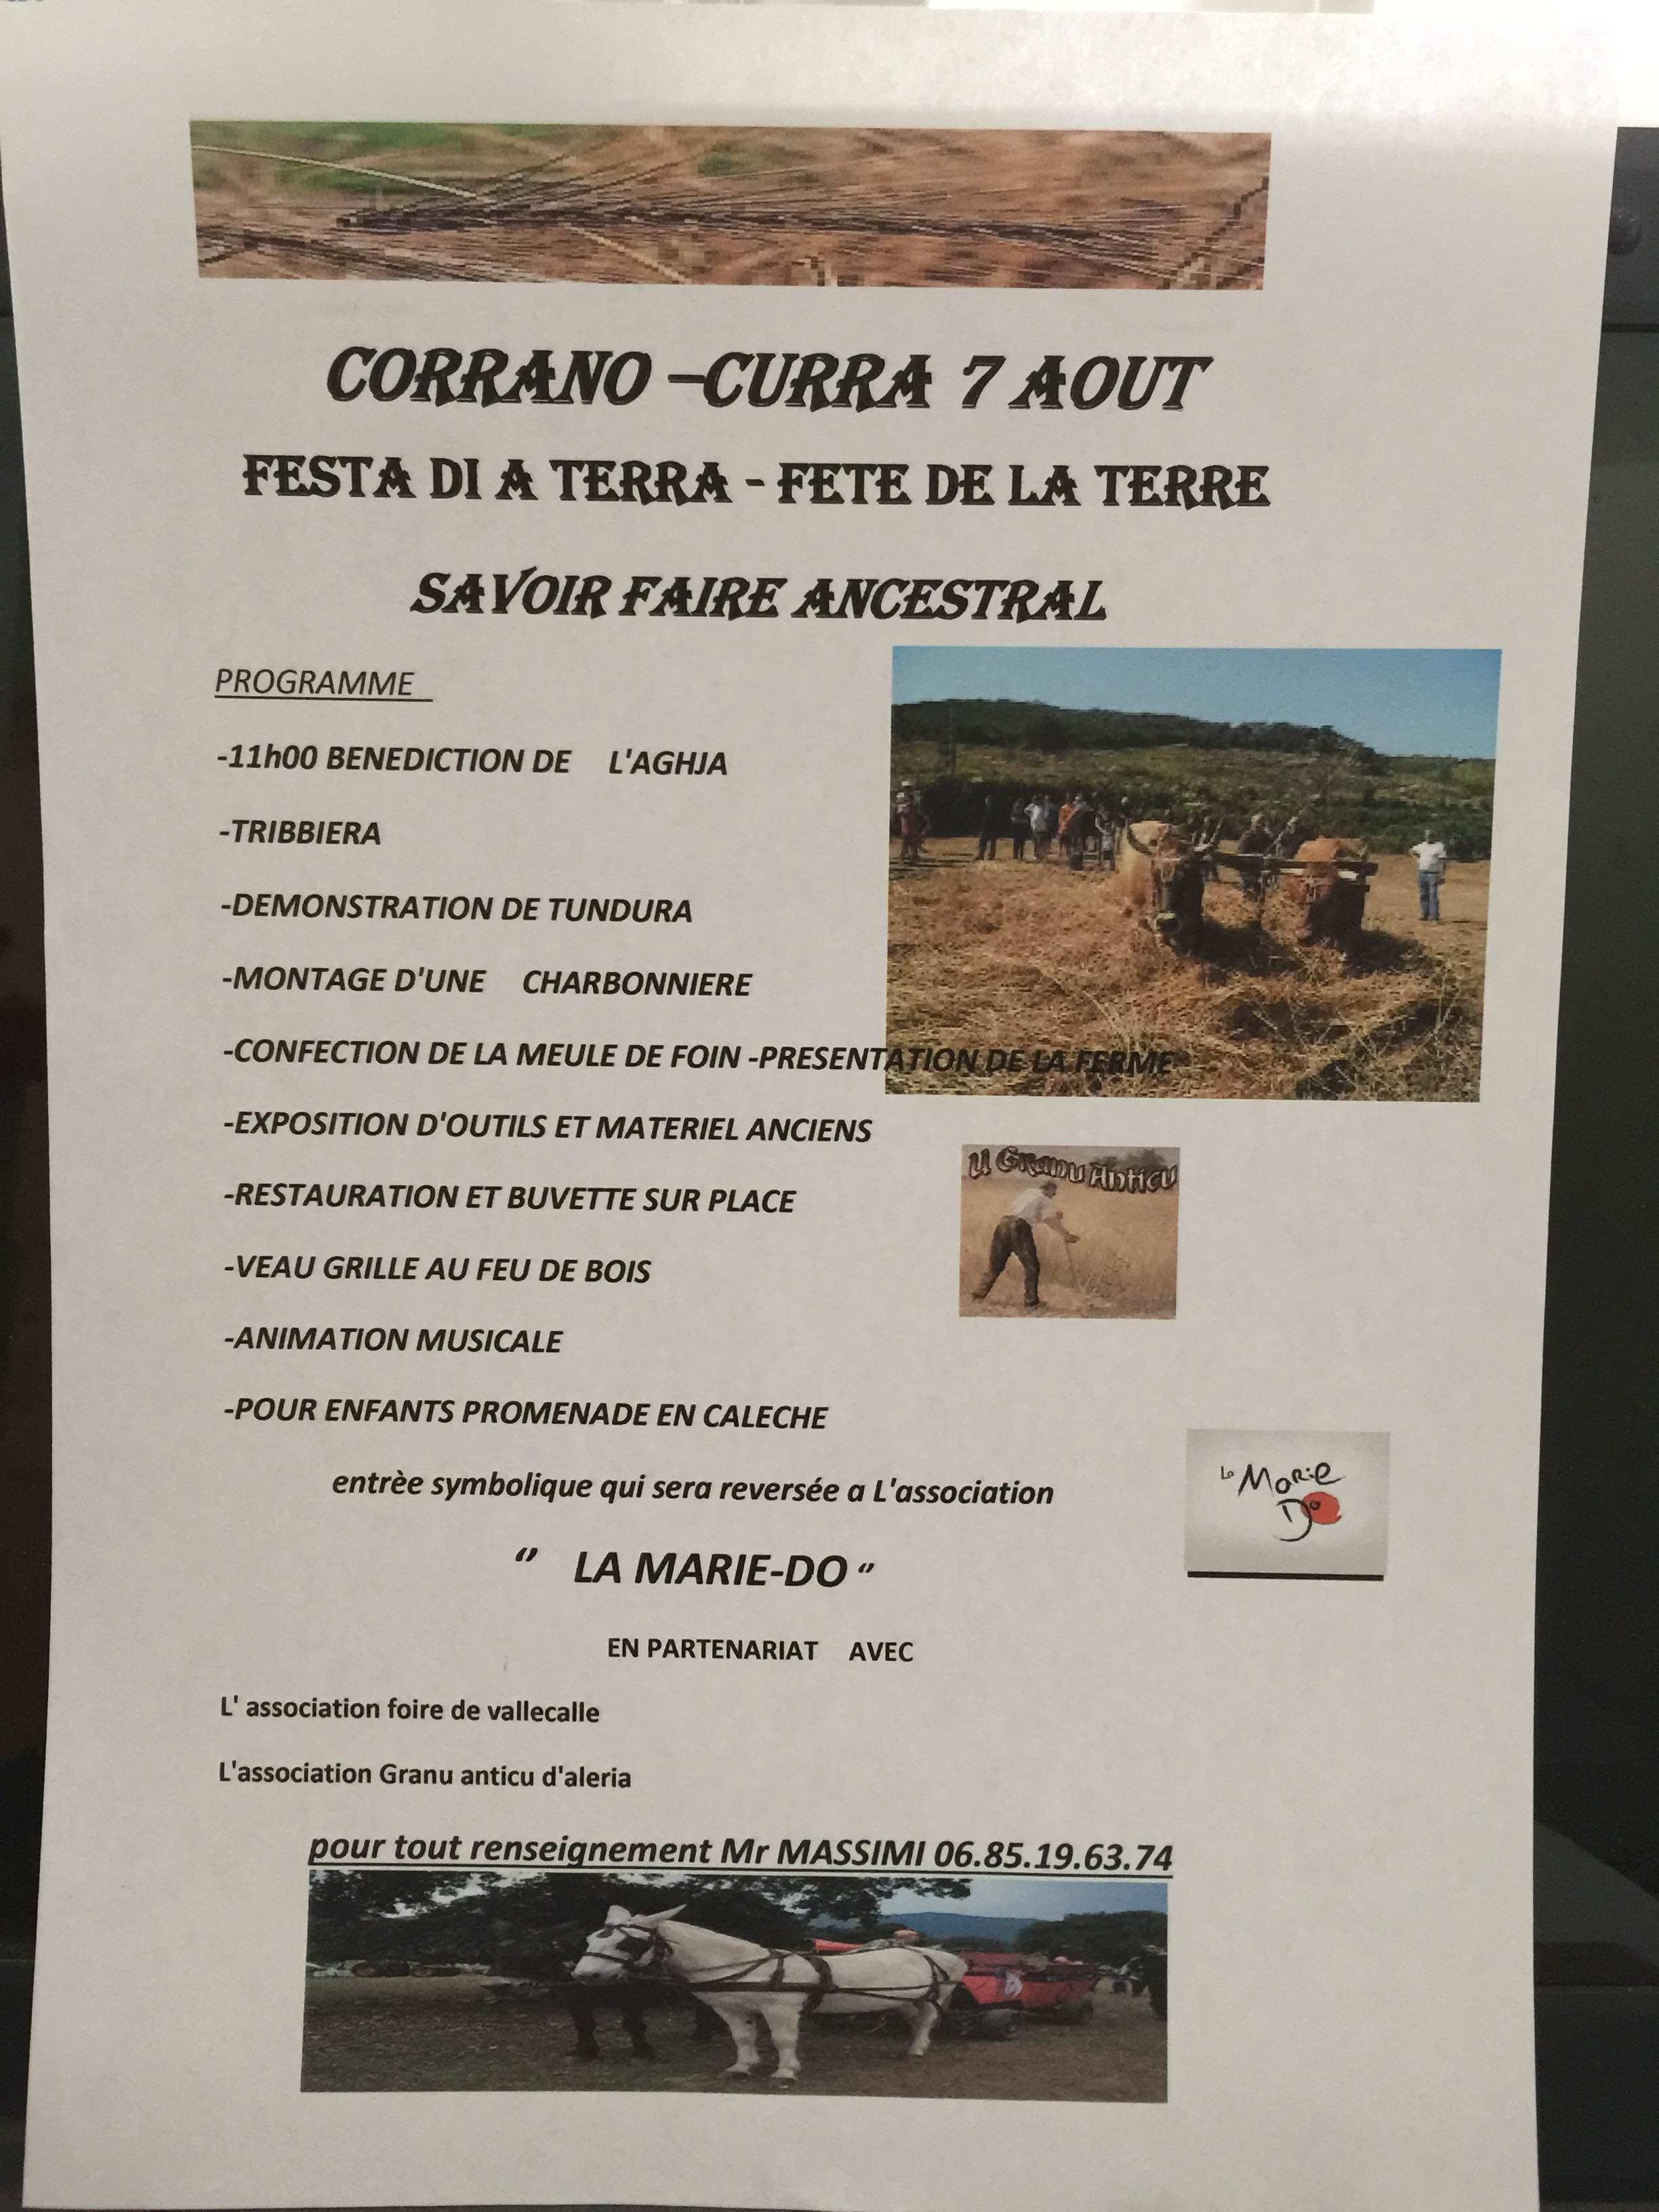 3ème édition de La Festa di a Terra à Corrano